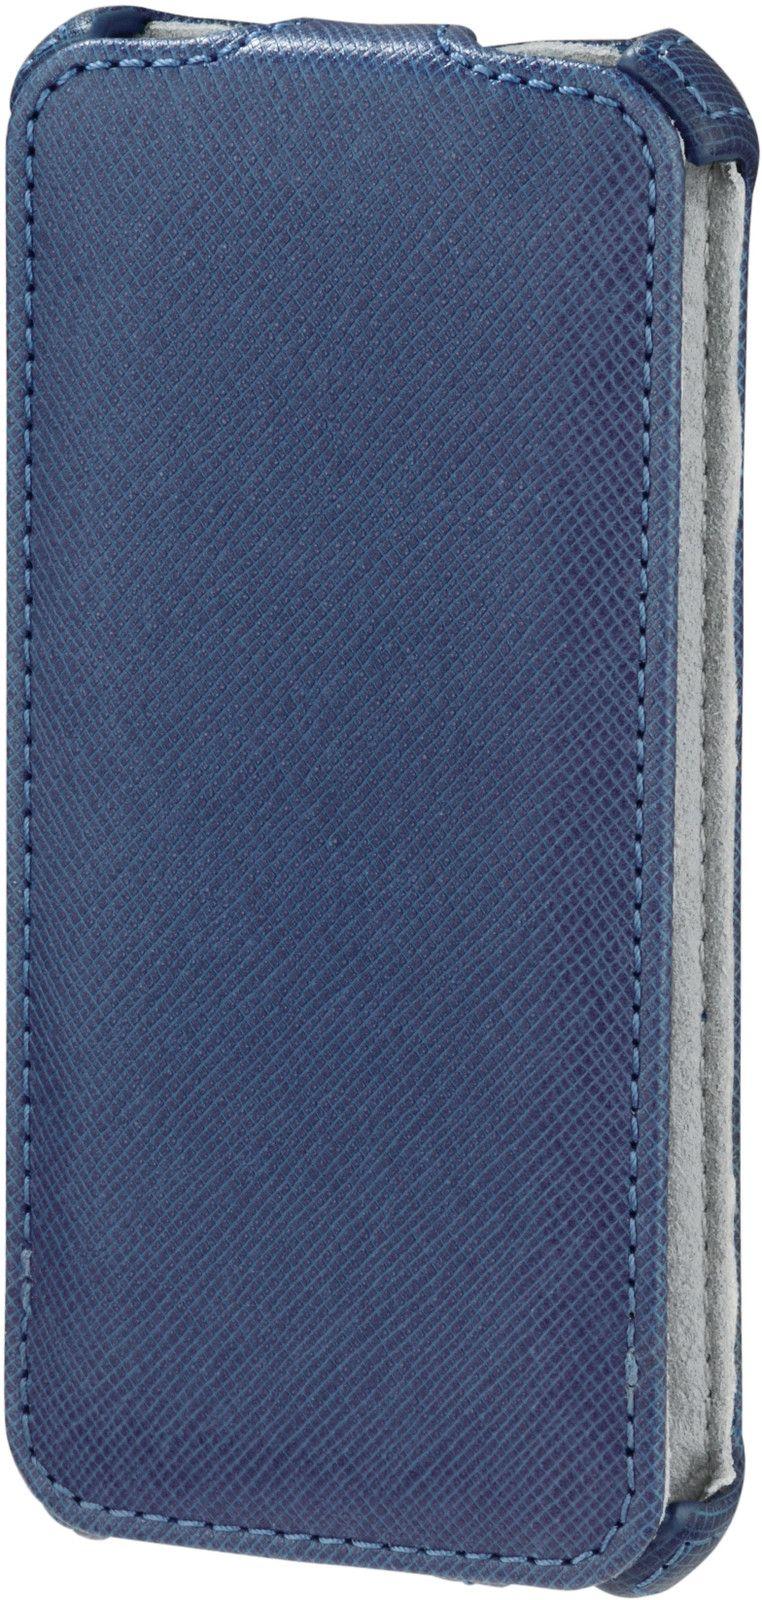 Hama Flip-Front Case (iPhone 5/5S/SE) - Blå